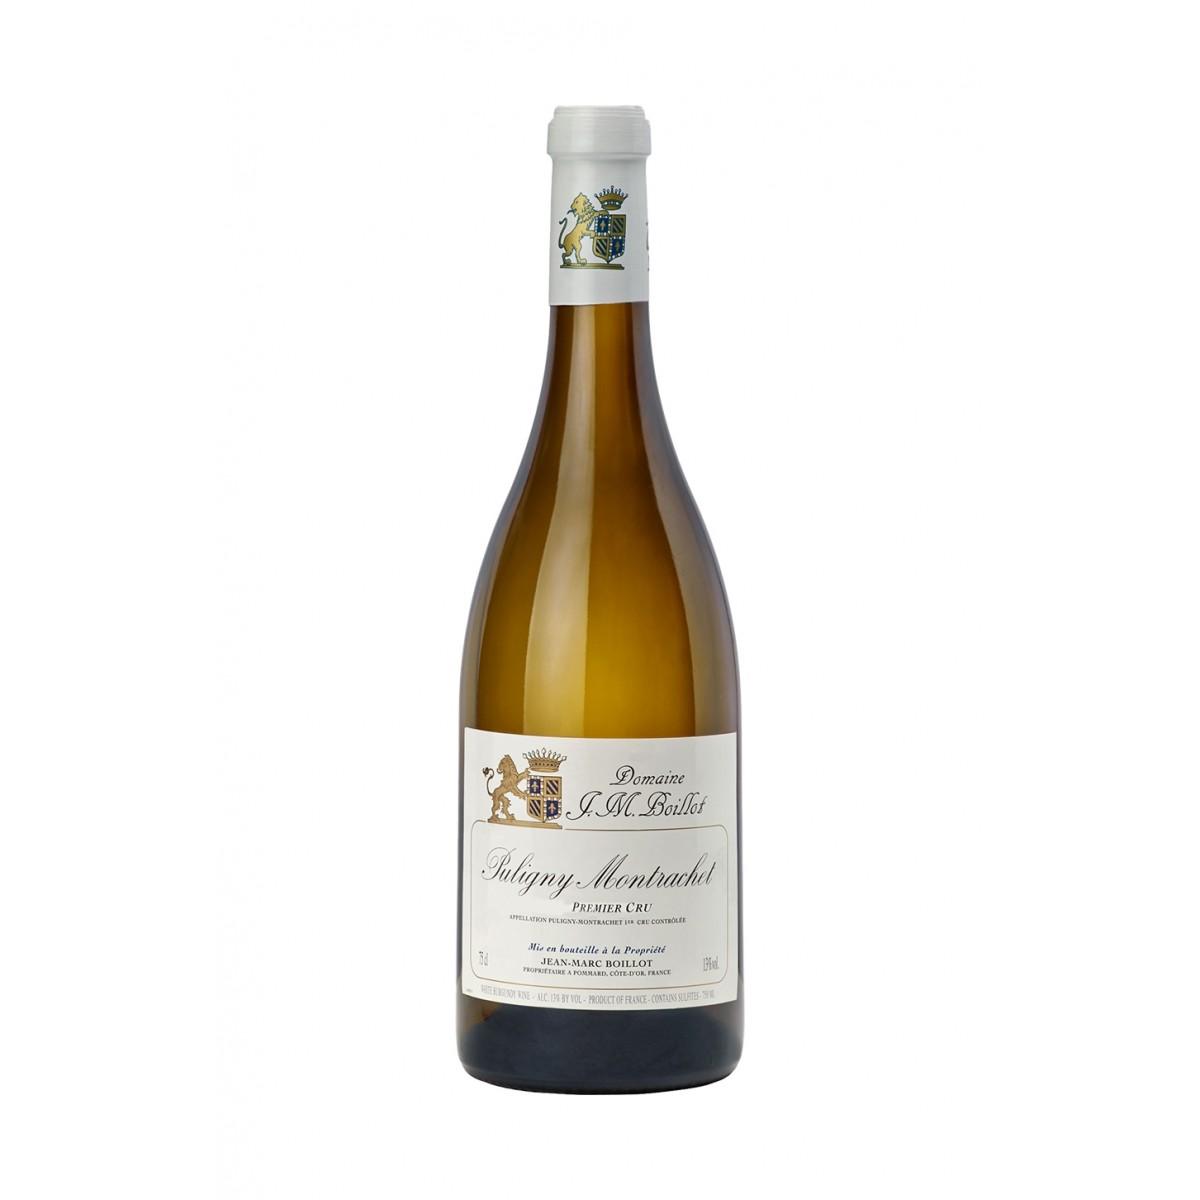 Puligny-Montrachet 1er Cru 2016 - Domaine Jean Marc Boillot